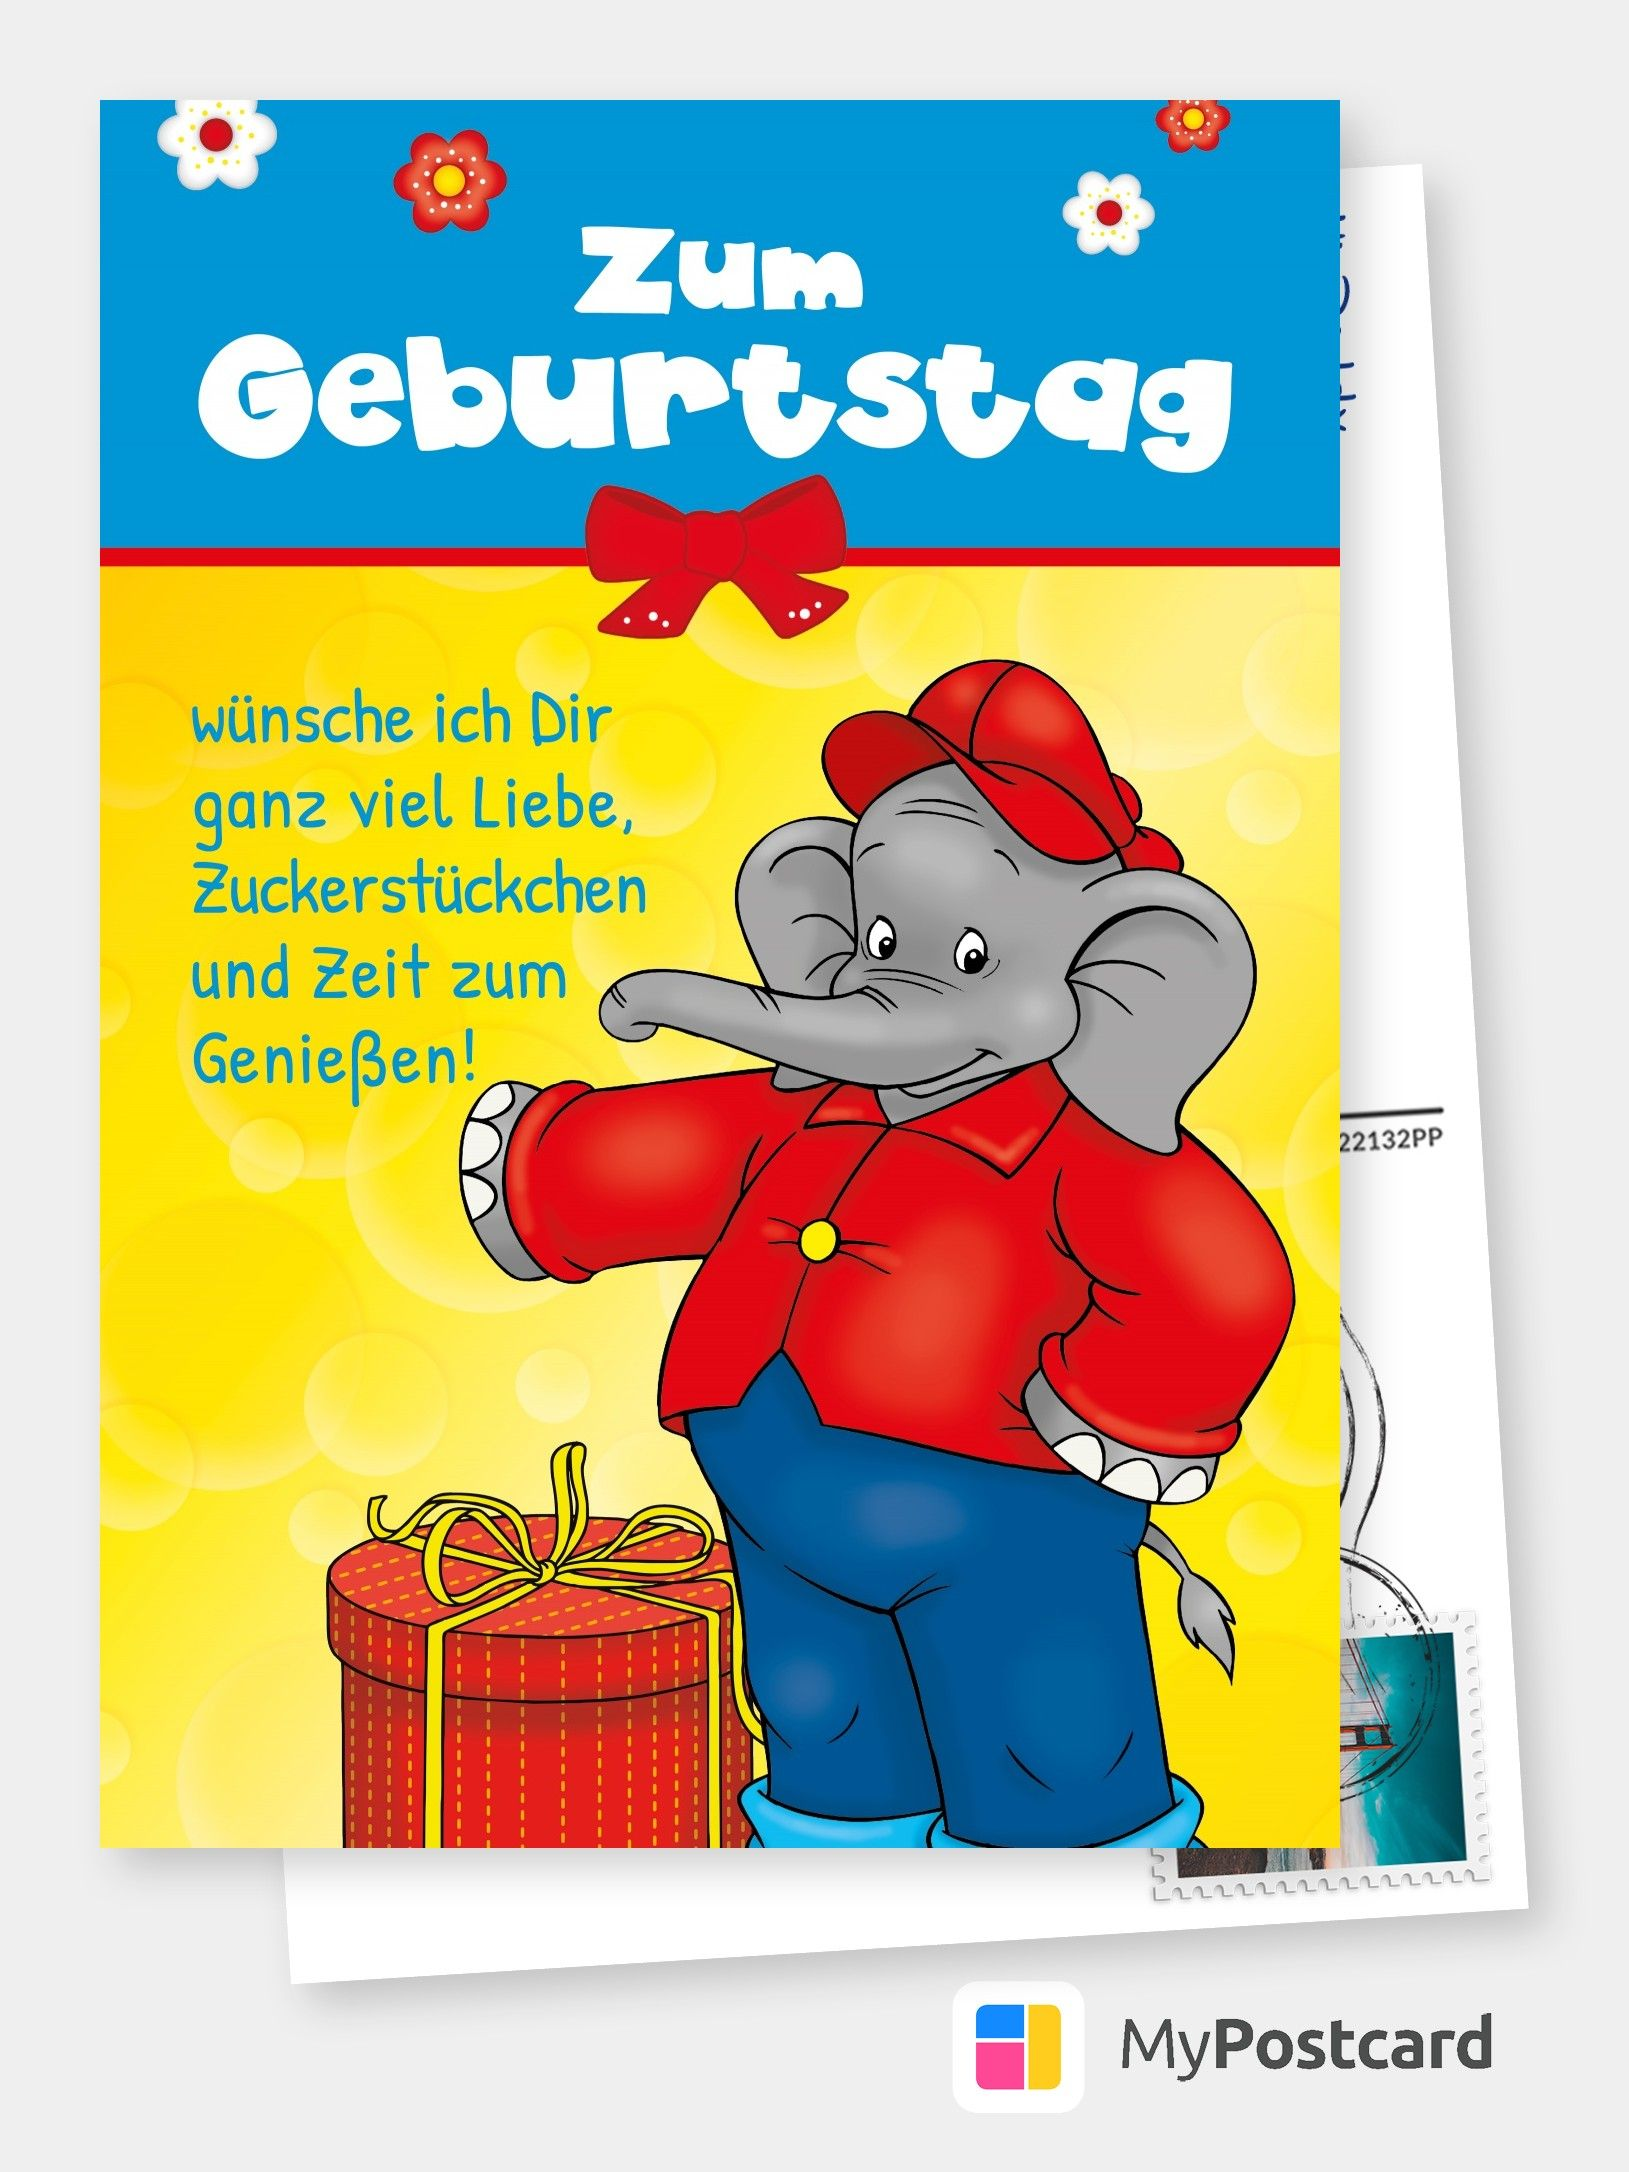 Benjamin Blumchen Geburtstagskarte Geburtstagswunsche Fur